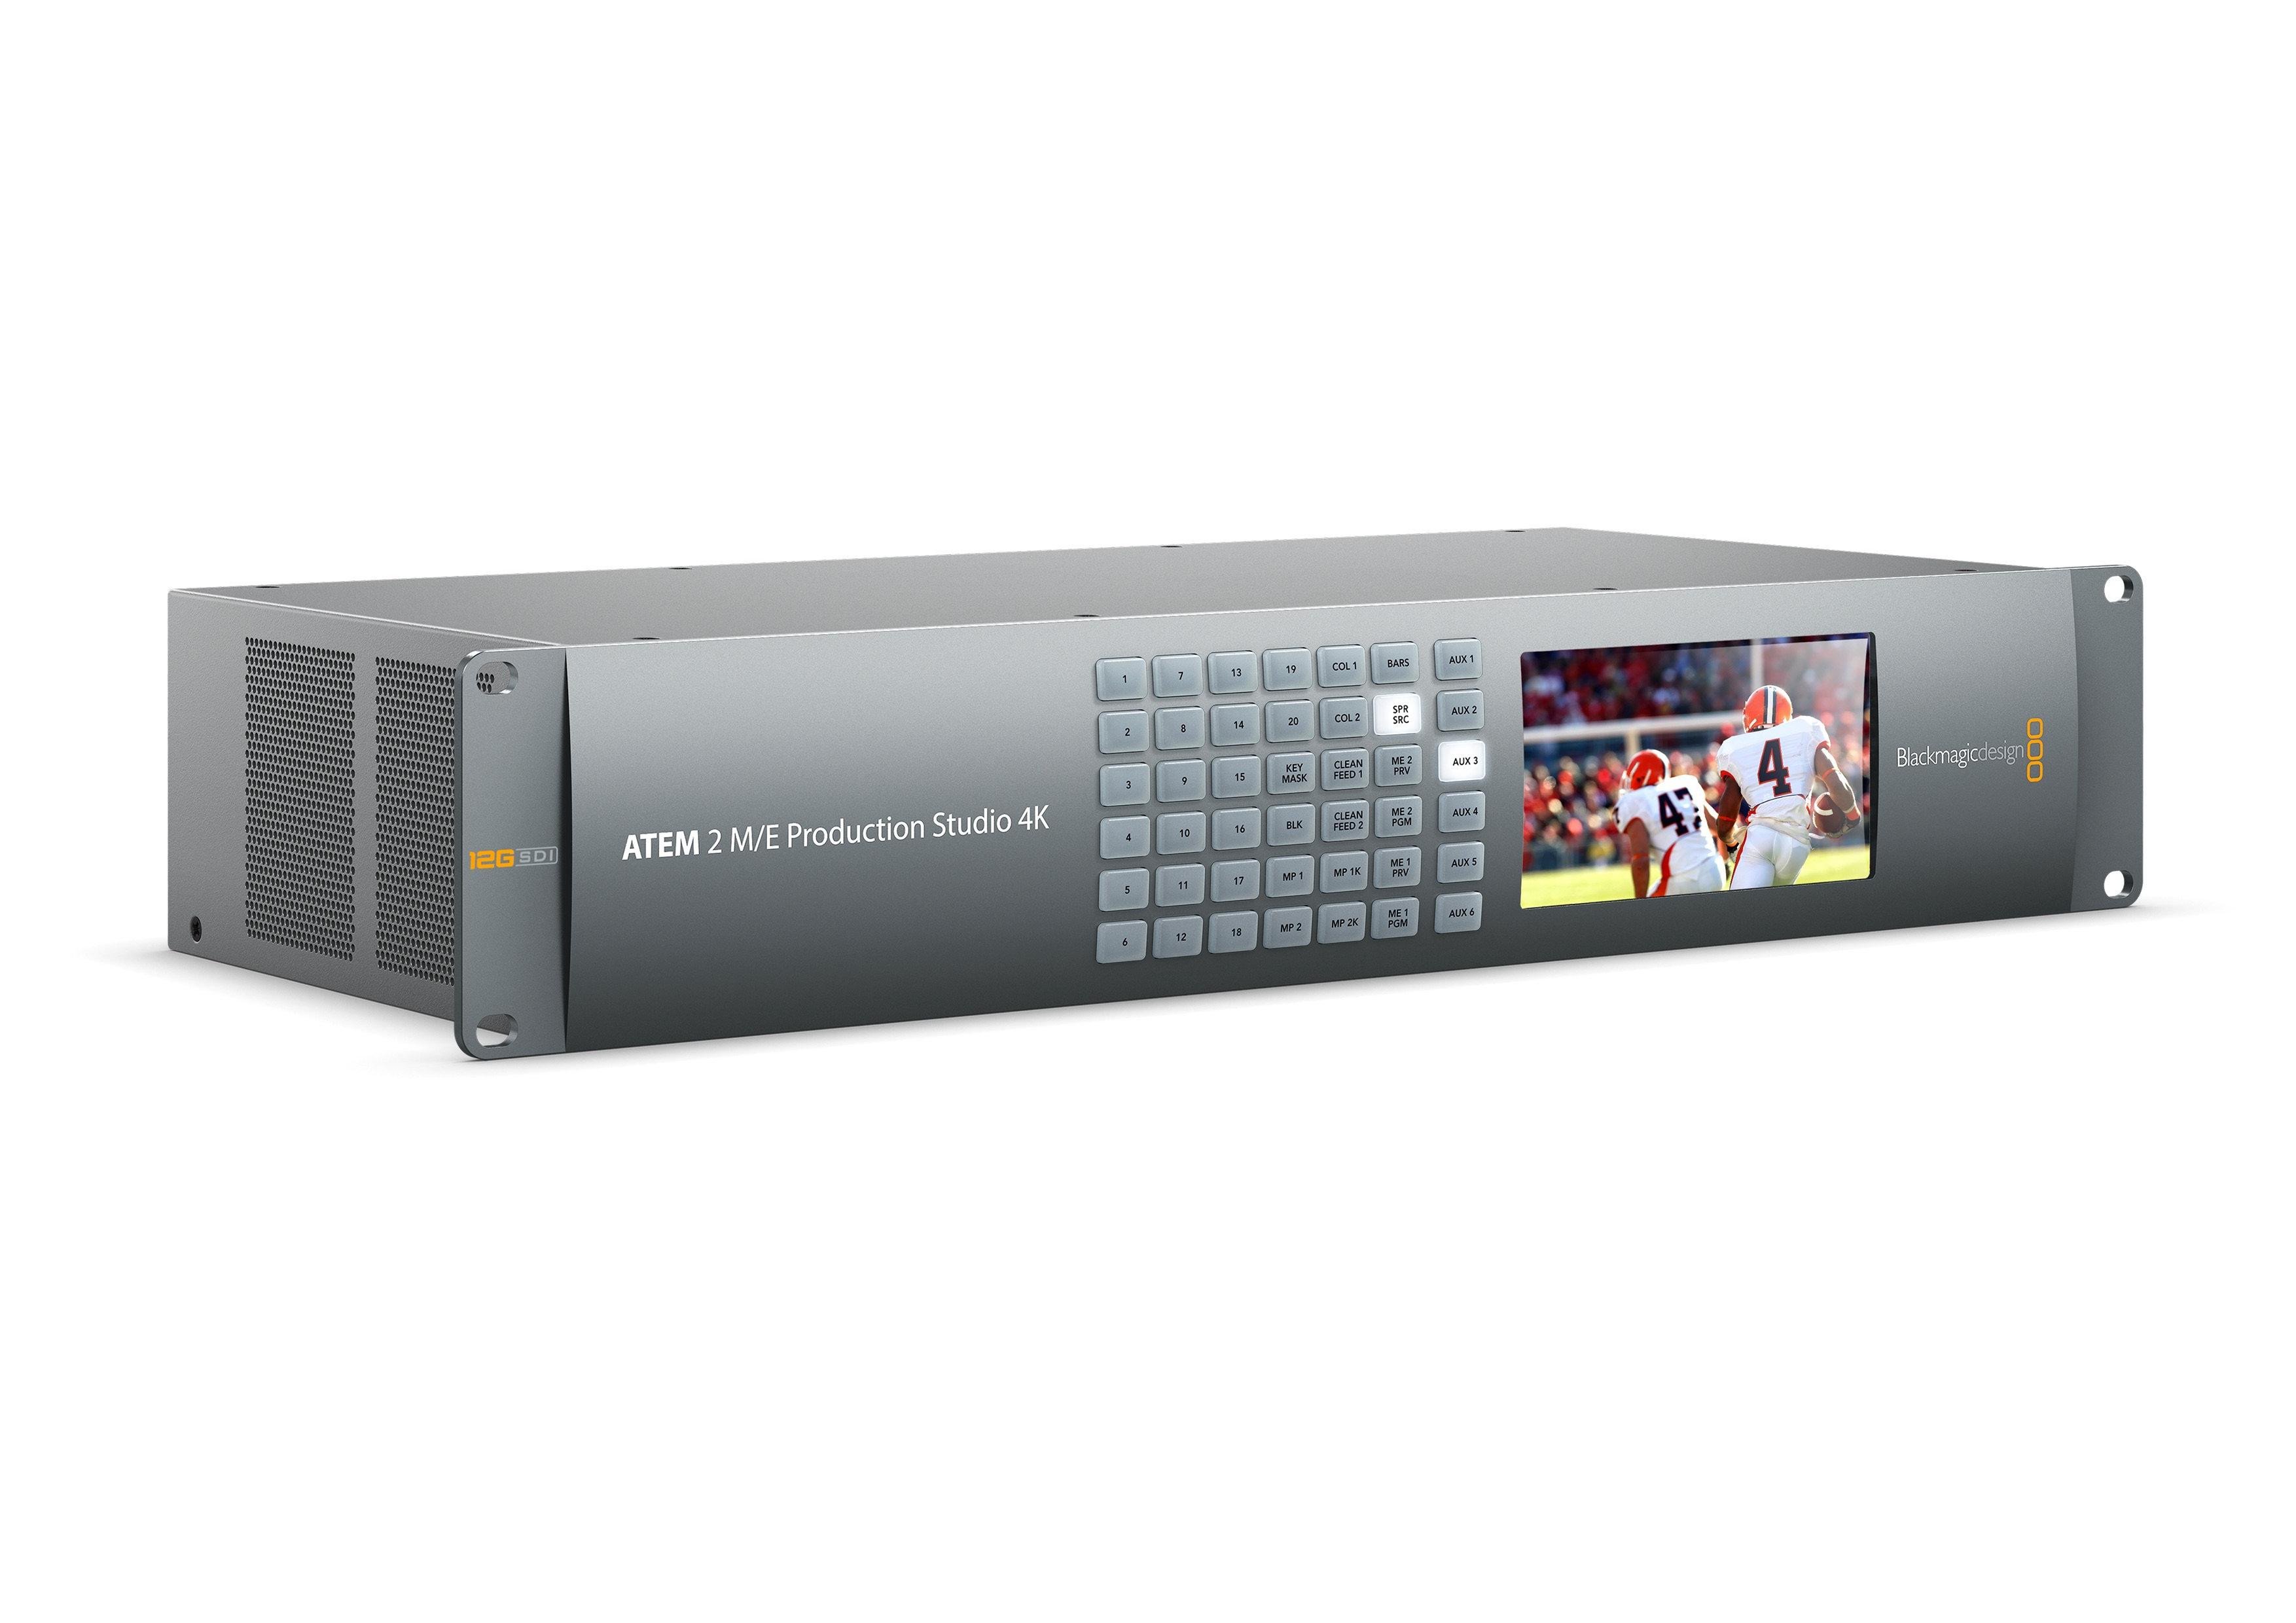 Mixer Video Blackmagic Atem 2 M E Production Studio 4k Video Switcher Digitalmediaeng